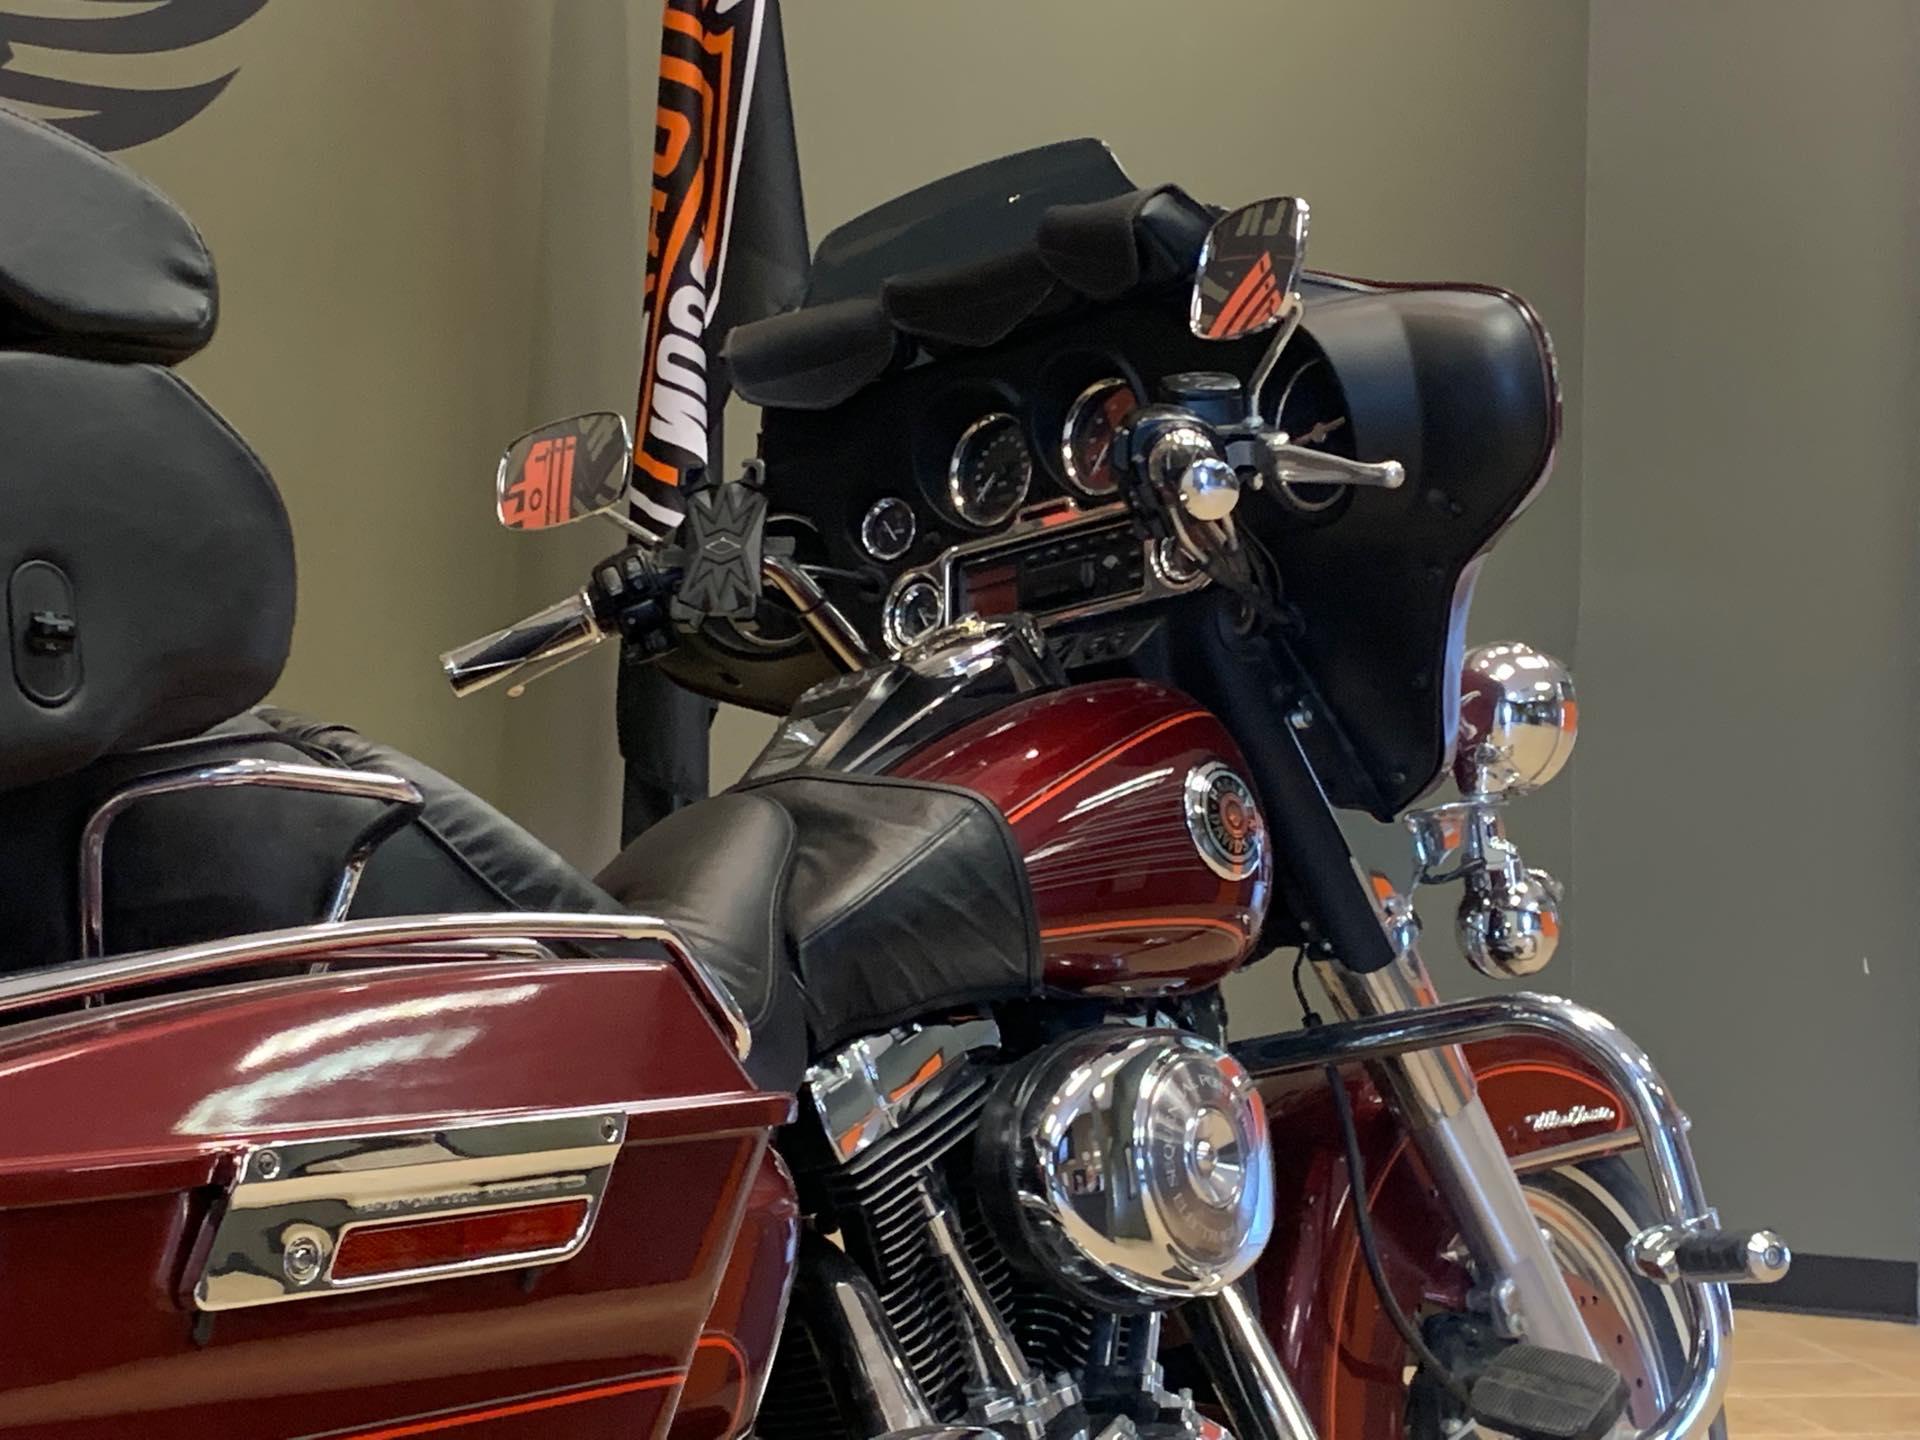 2002 HARLEY-DAVIDSON FLHTCU at Loess Hills Harley-Davidson